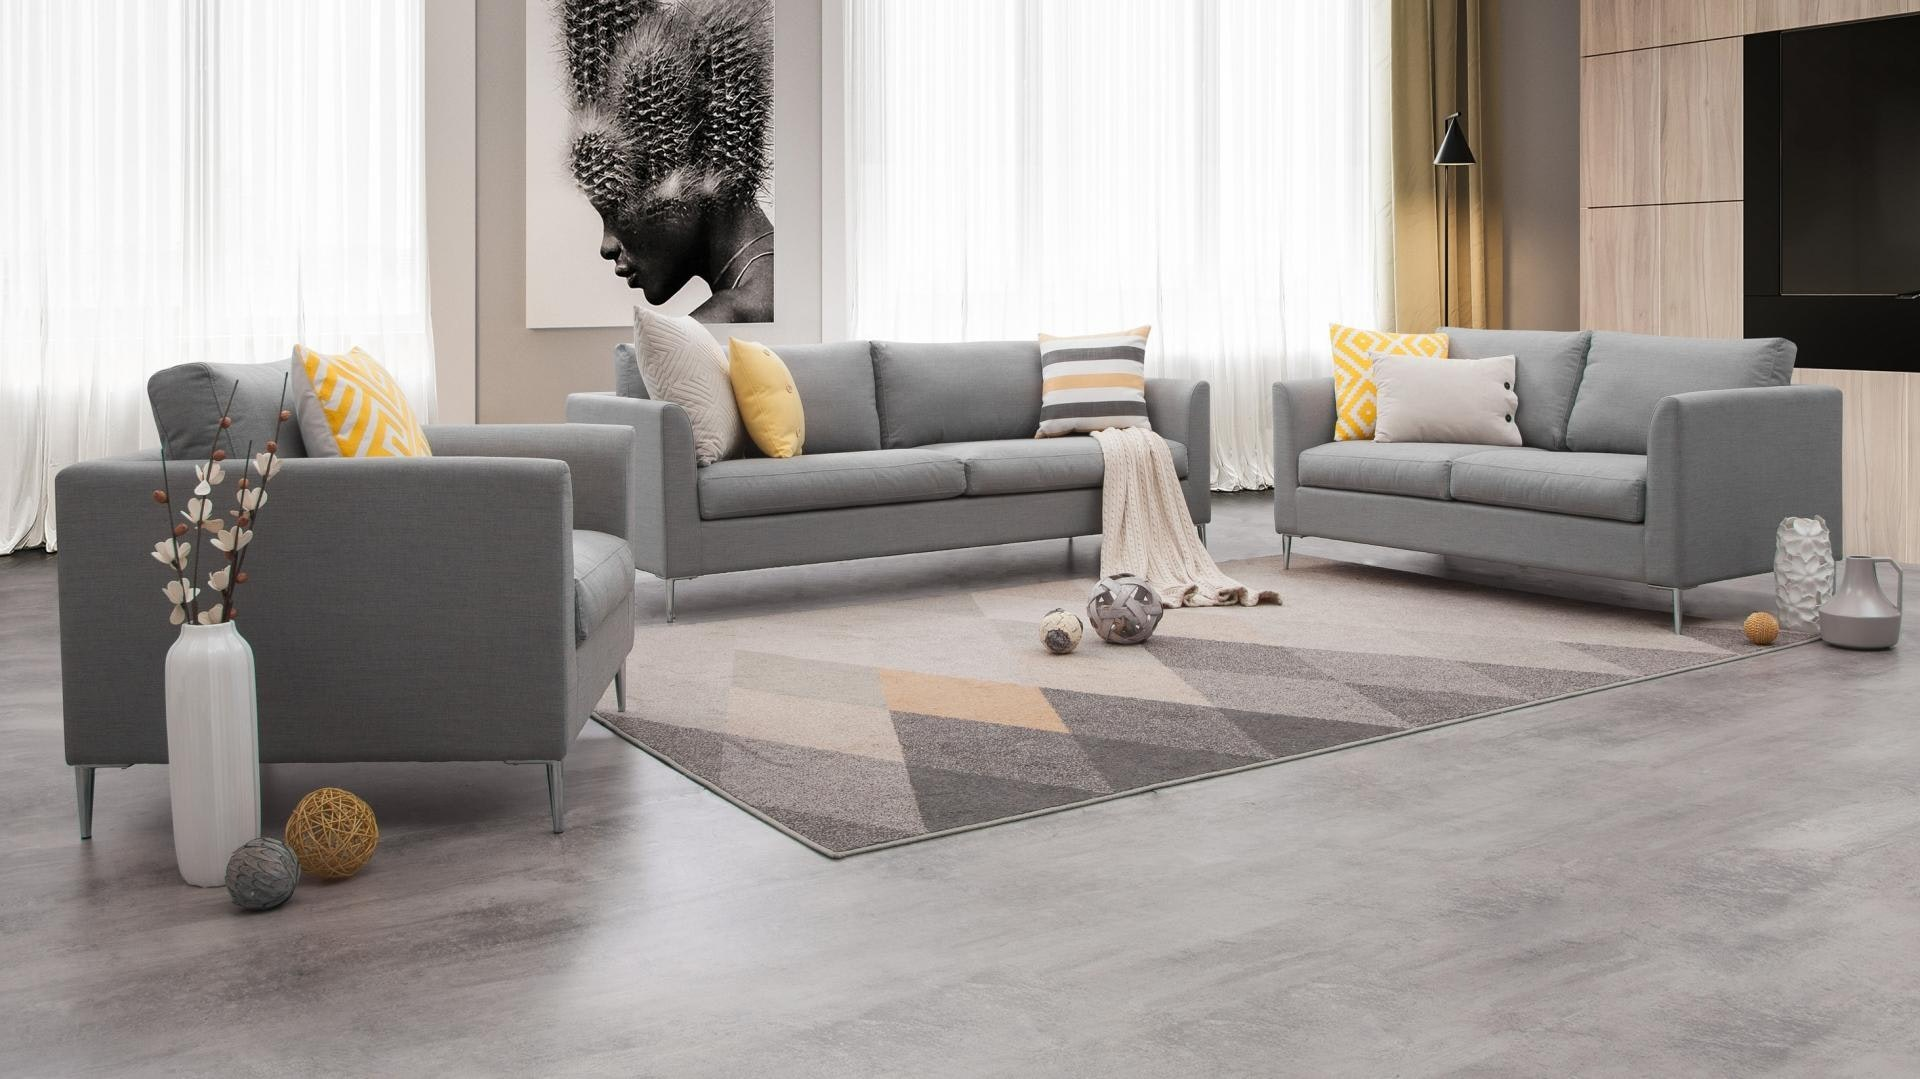 hubble sofa suite 3 2 1 lounge life. Black Bedroom Furniture Sets. Home Design Ideas